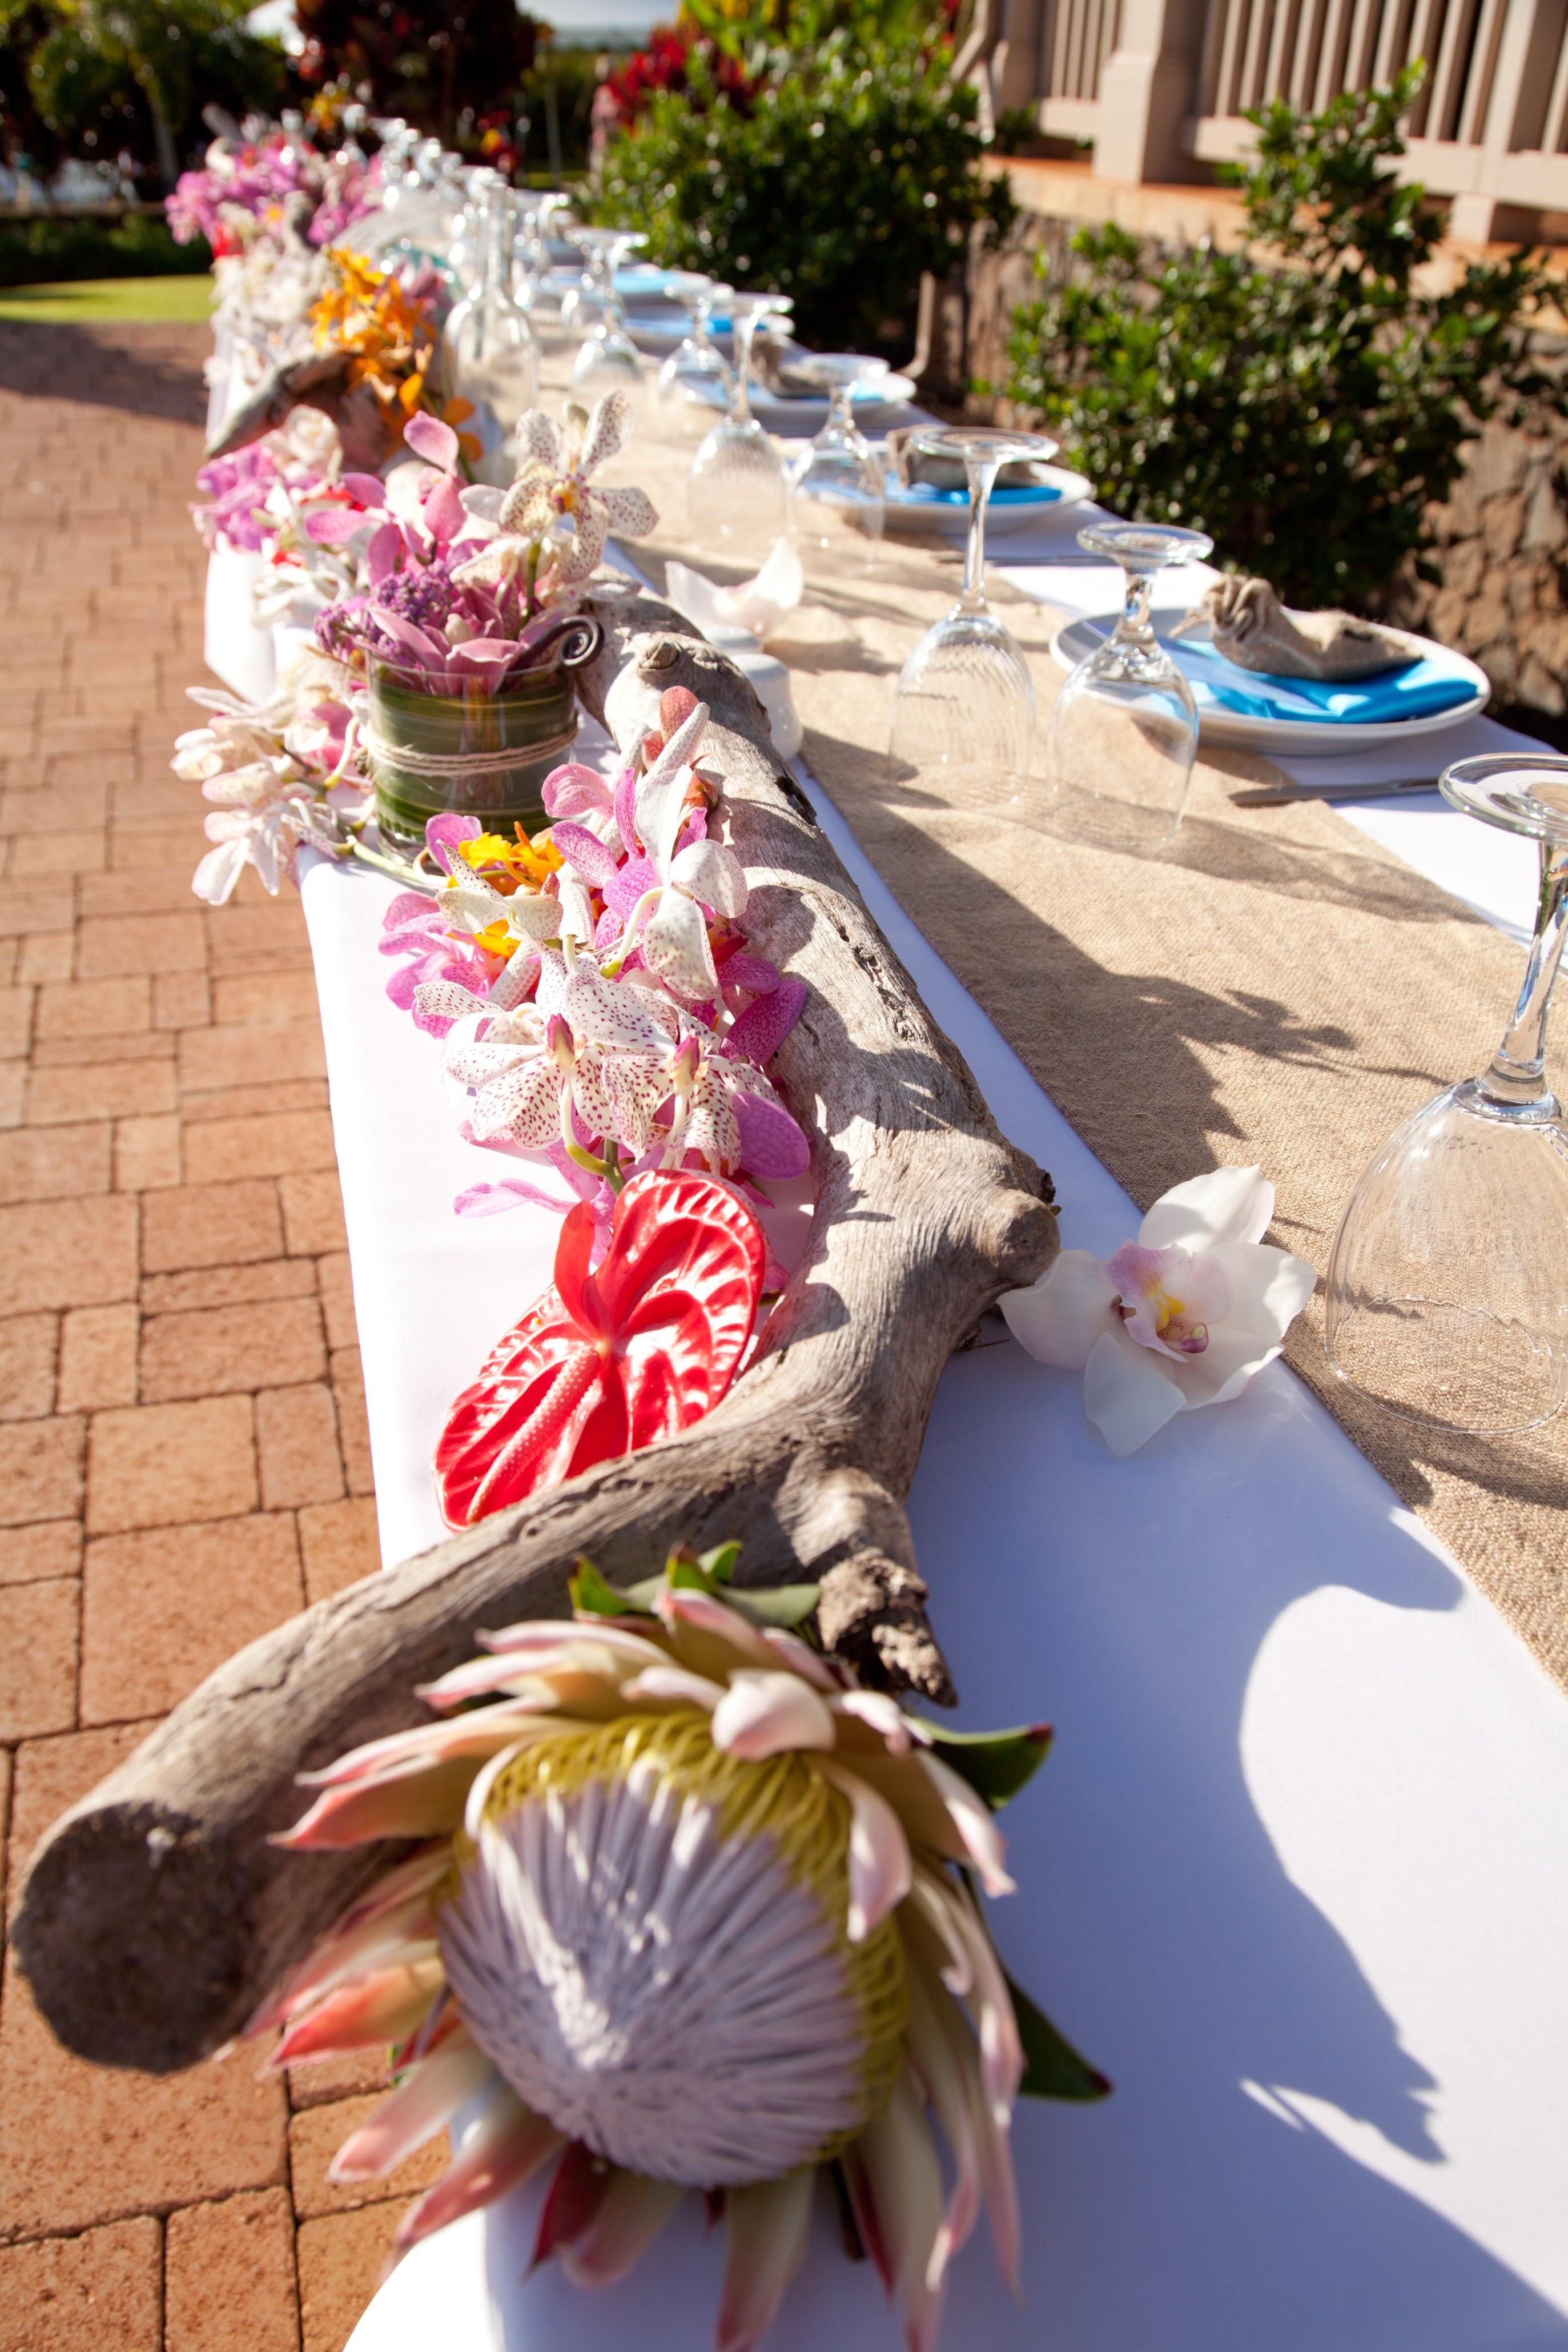 white flower vases for sale of wedding vase for sale pictures il fullxfull h vases black vase white throughout wedding vase for sale images prices for flowers for a wedding art exhibition wedding decoration of